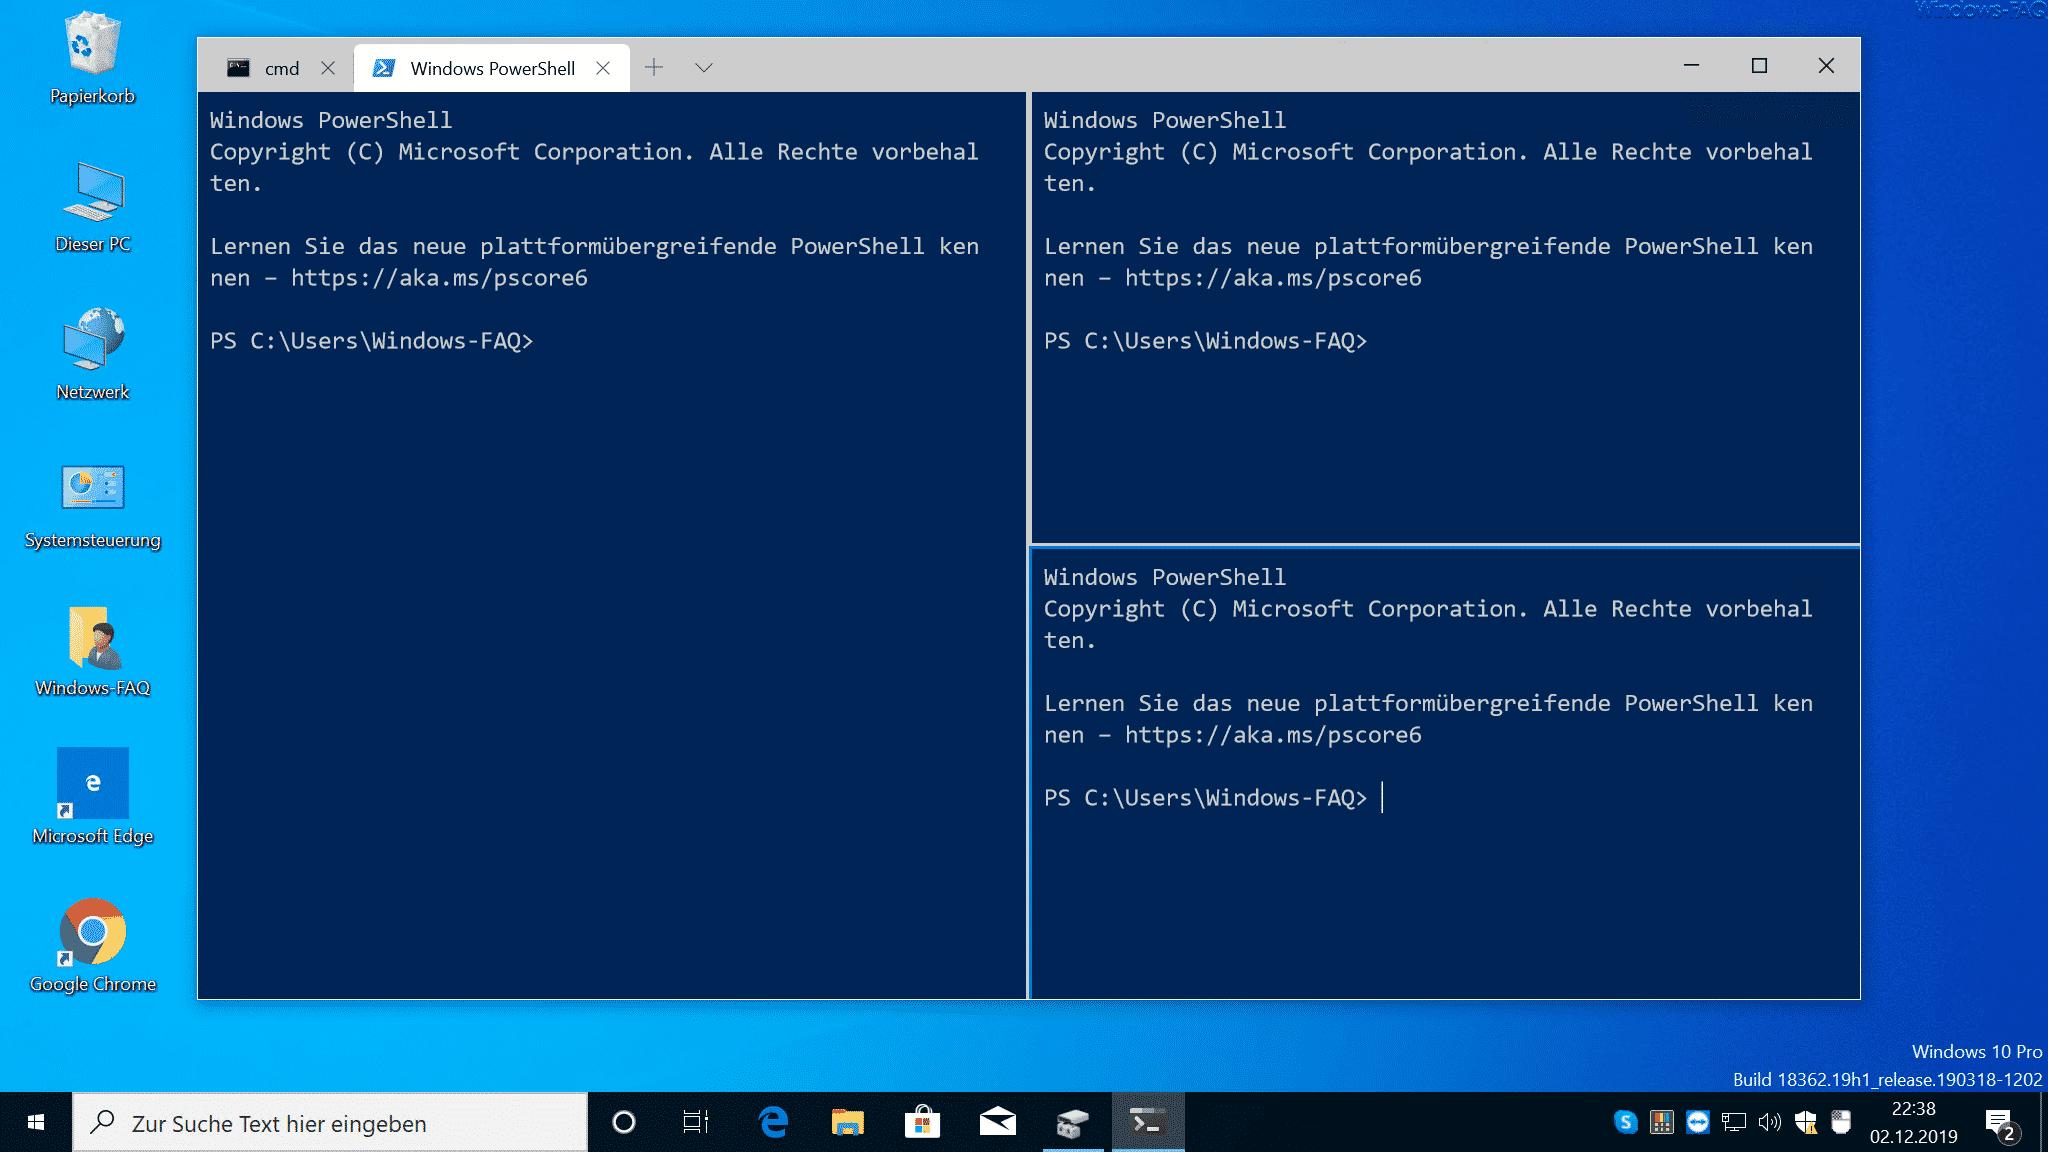 Windows Terminal Eingabeaufforderung & PowerShell